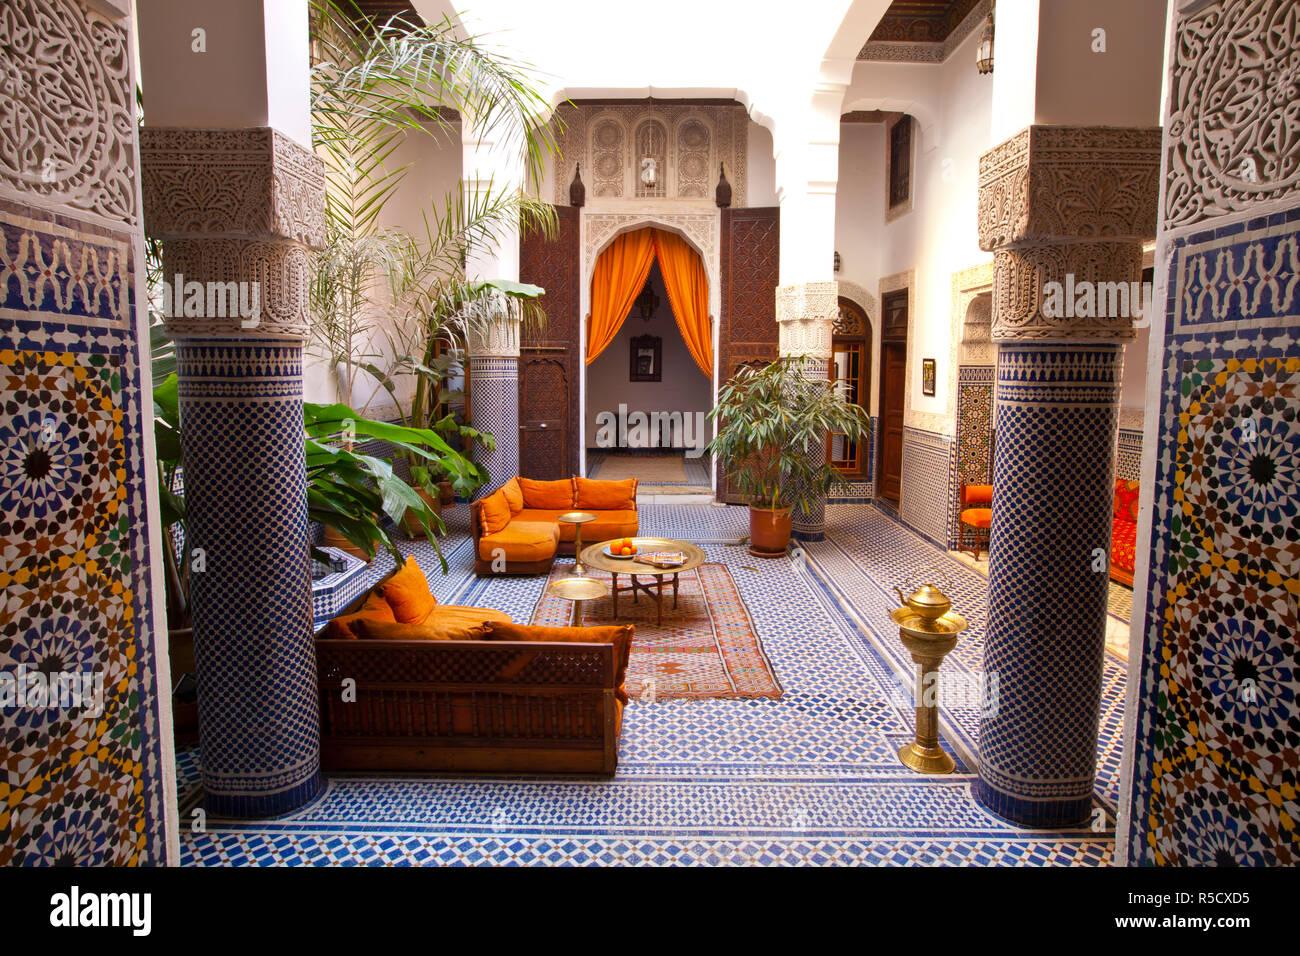 Riad interior, Fes, Morocco - Stock Image